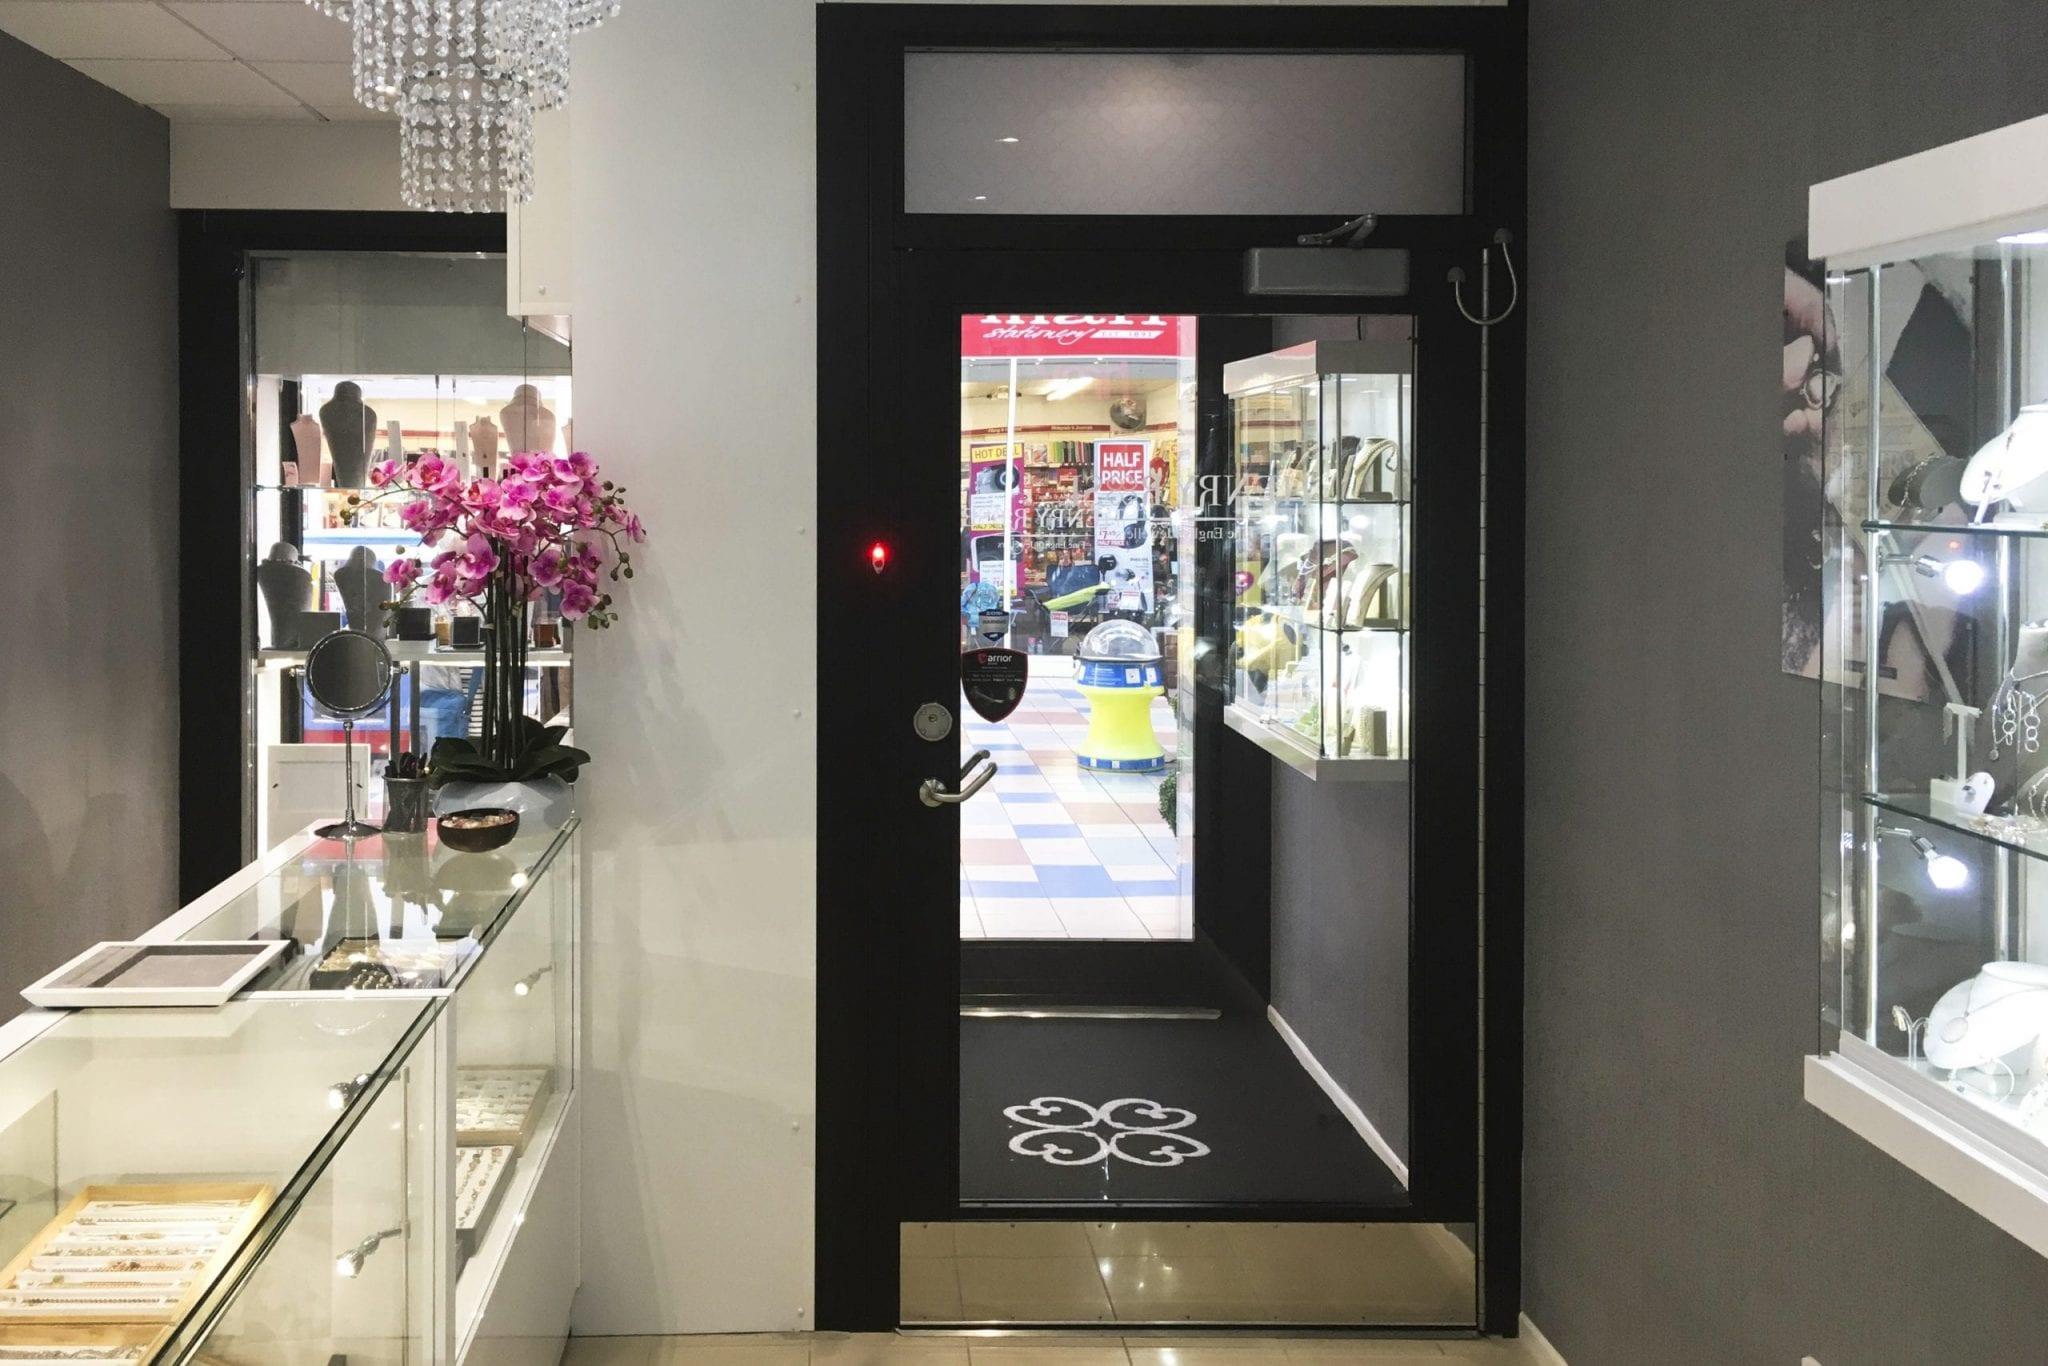 Warrior Fully Glazed Interlocking Doors Swing & Sliding Door Combination from inside Henry Role Jewellers